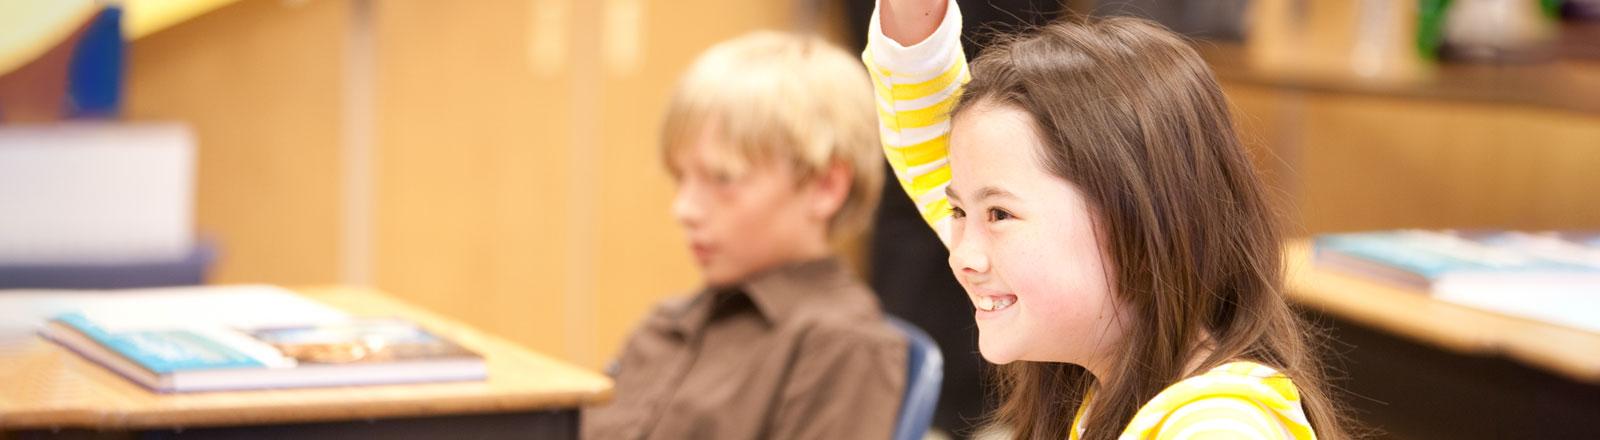 Child raising hand in classroom